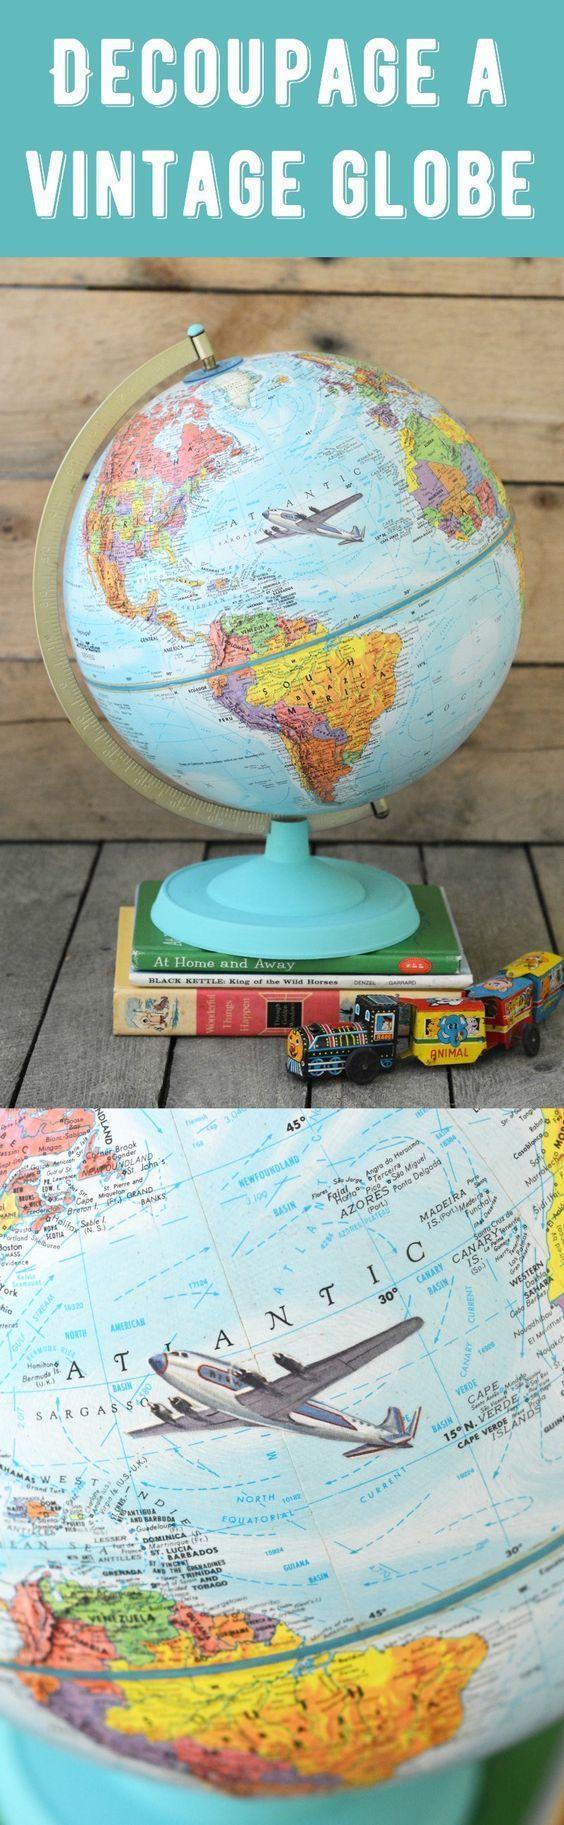 Decoupaged chalky vintage globe 52 best Maps